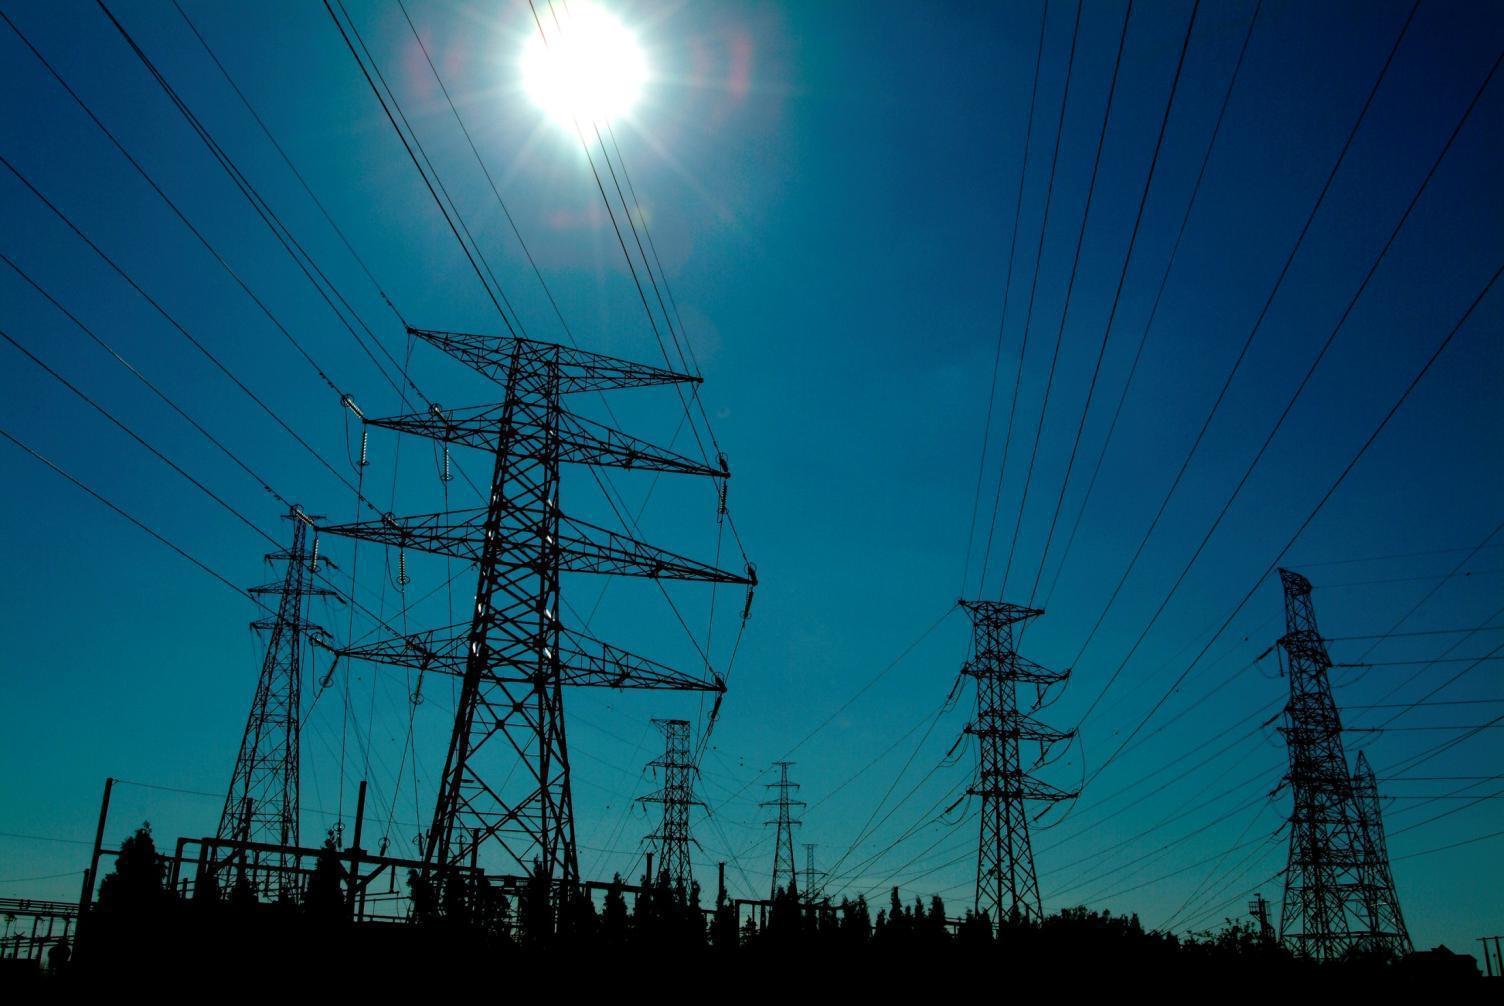 Energie-electrique-barrage.jpg